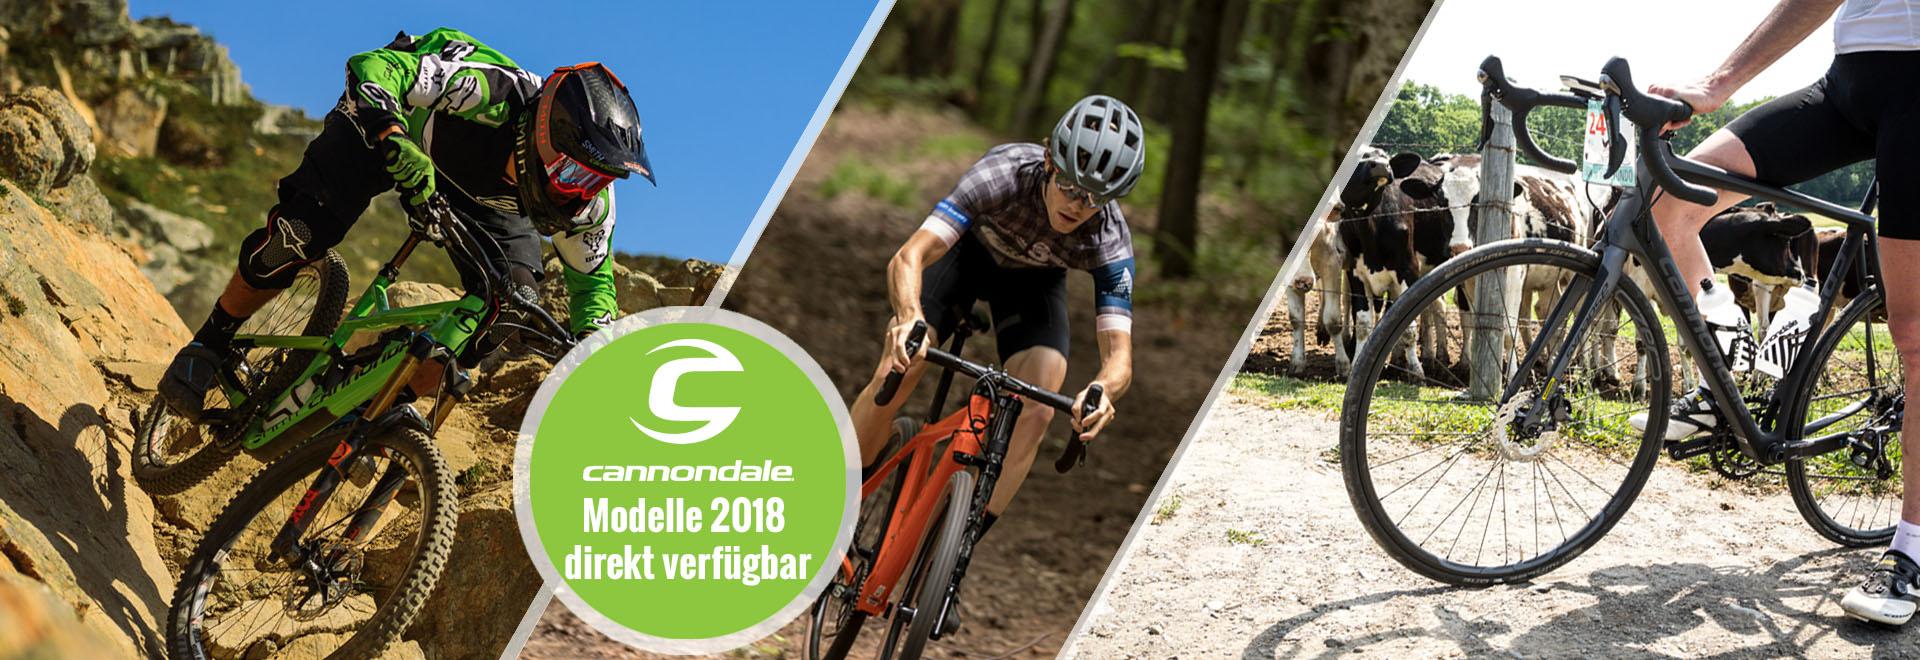 Cannondale Rennräder und Mountainbikes 2018, Caad12, Slate, Supersix, Synapse, Moterra